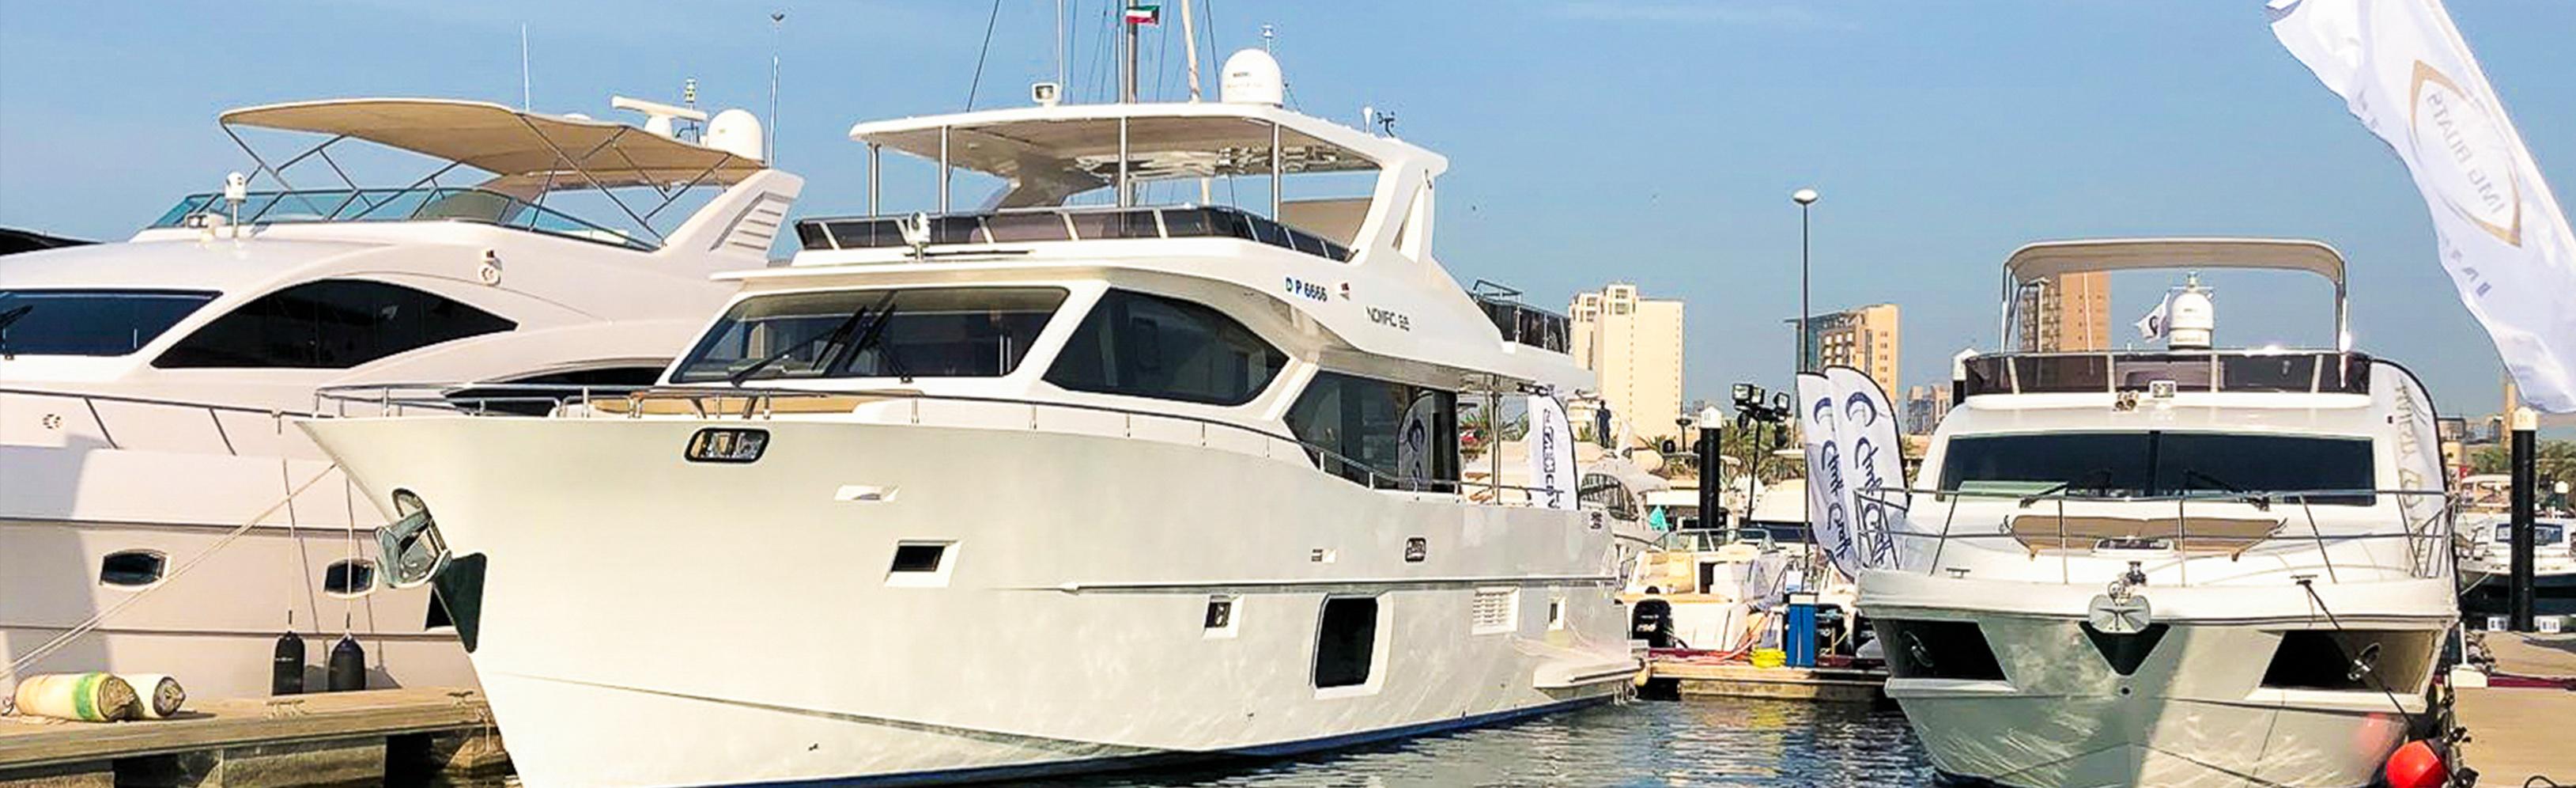 Gulf-Craft,-Kuwait-Yacht-Show